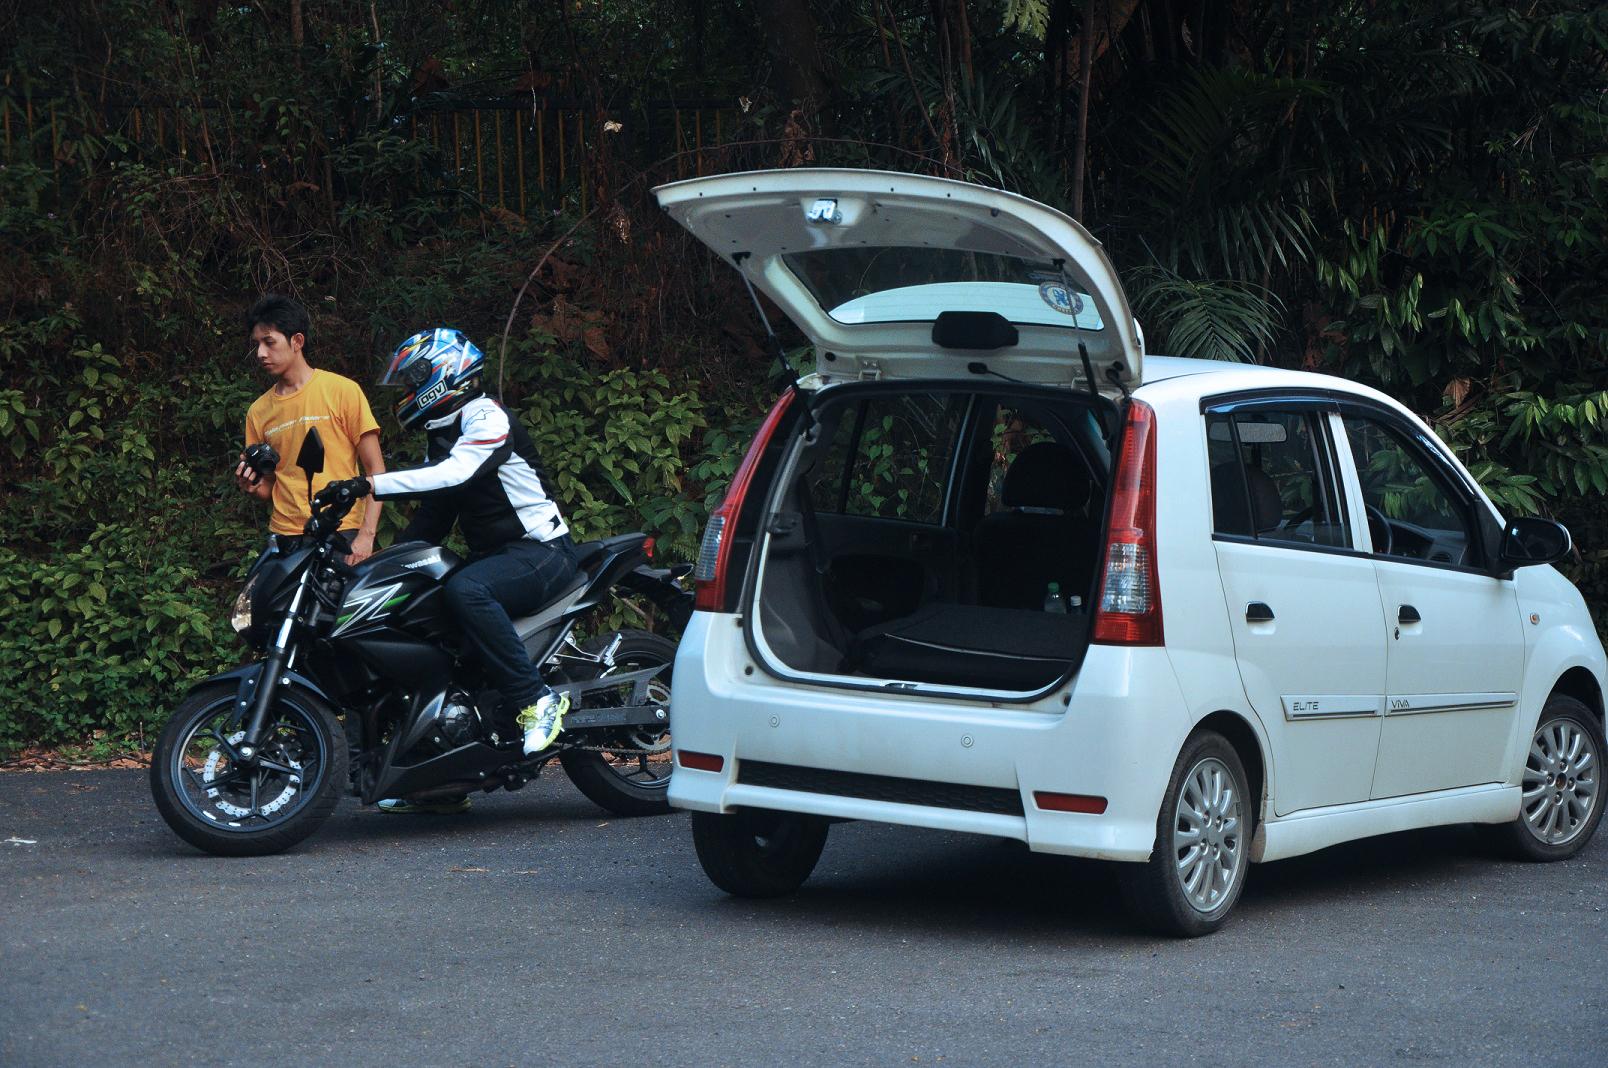 Z250 Malaysian Riders